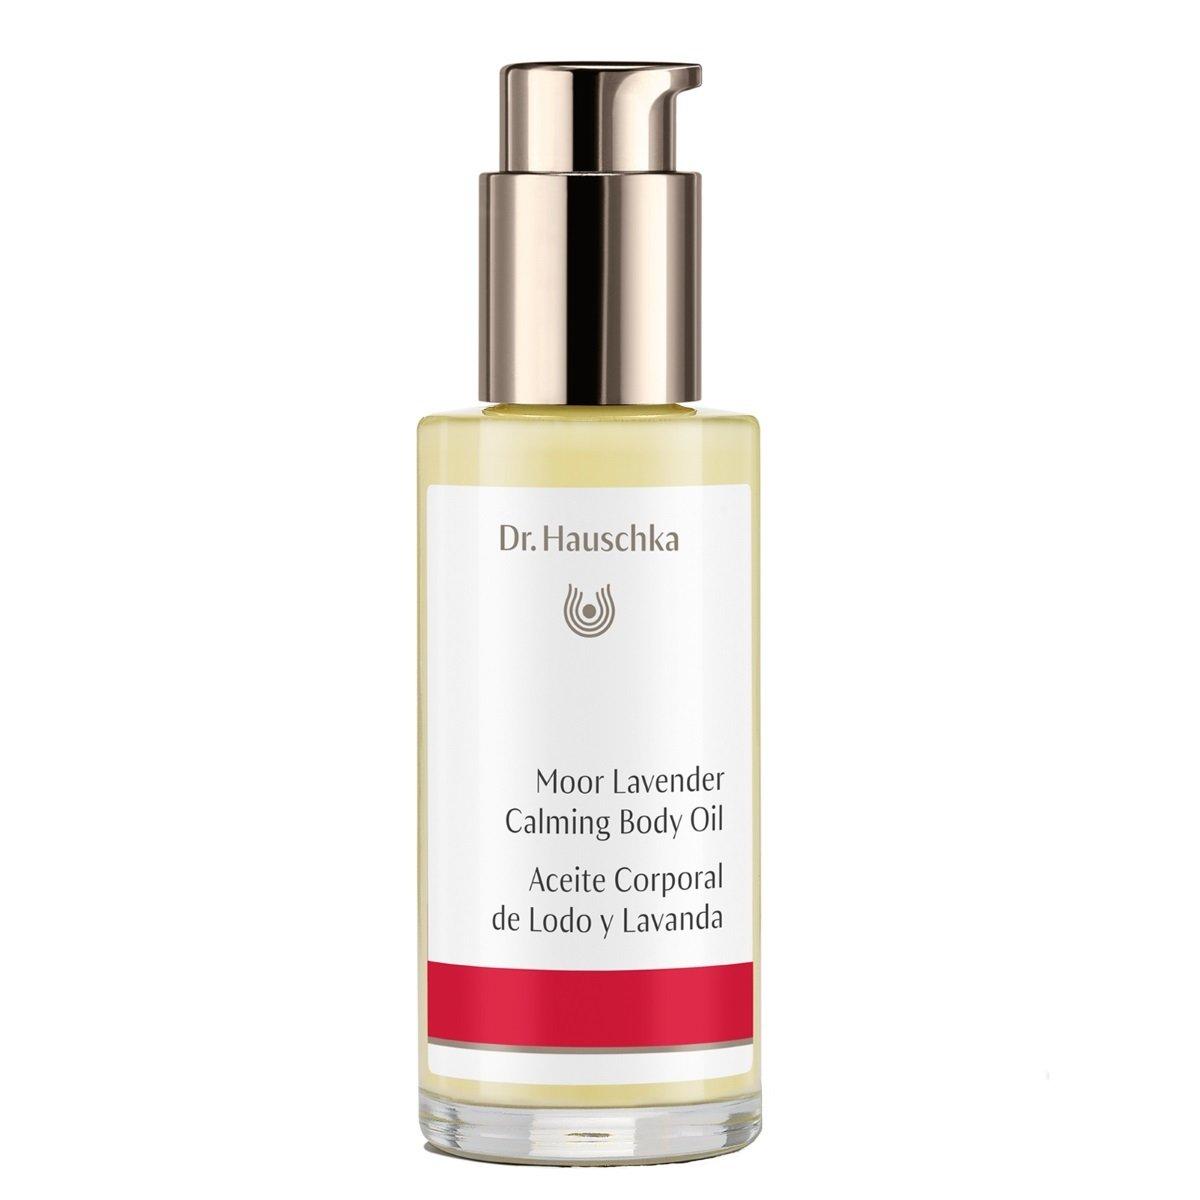 Dr. Hauschka Moor Lavender Calming Body Oil, 2.5 oz